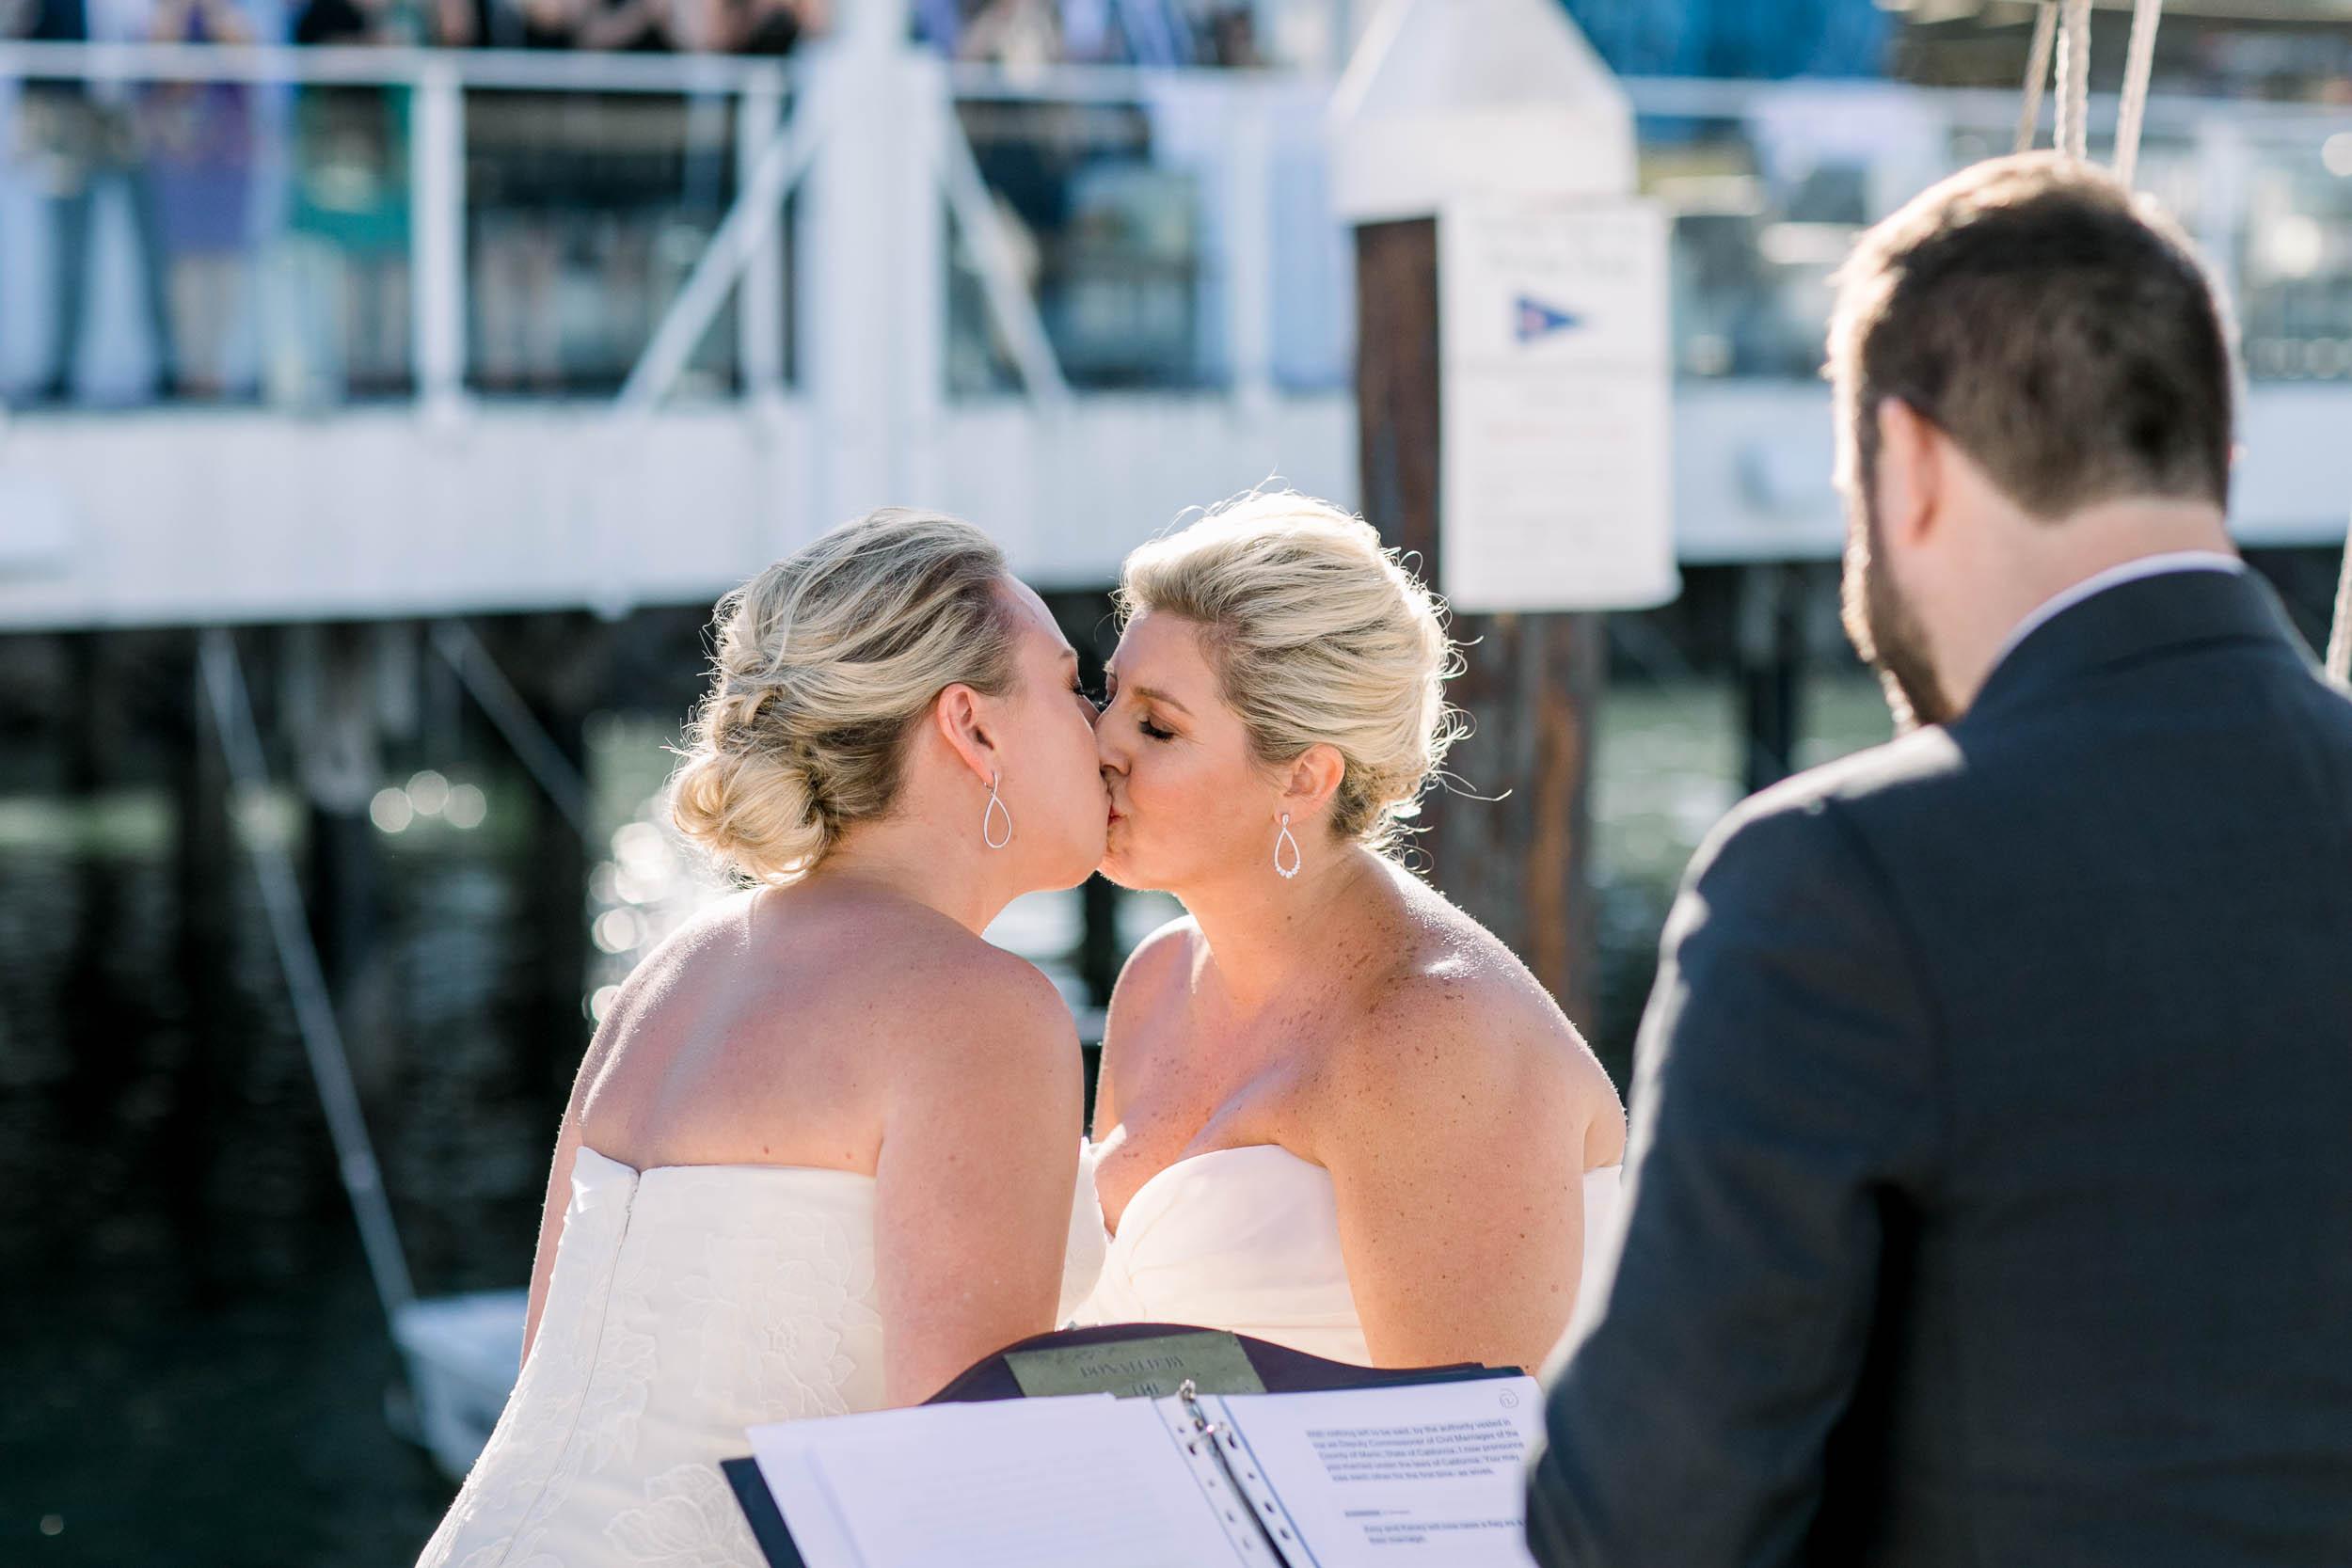 092218ER575_Sausalito Yacht Club Wedding_Buena Lane Photography.jpg